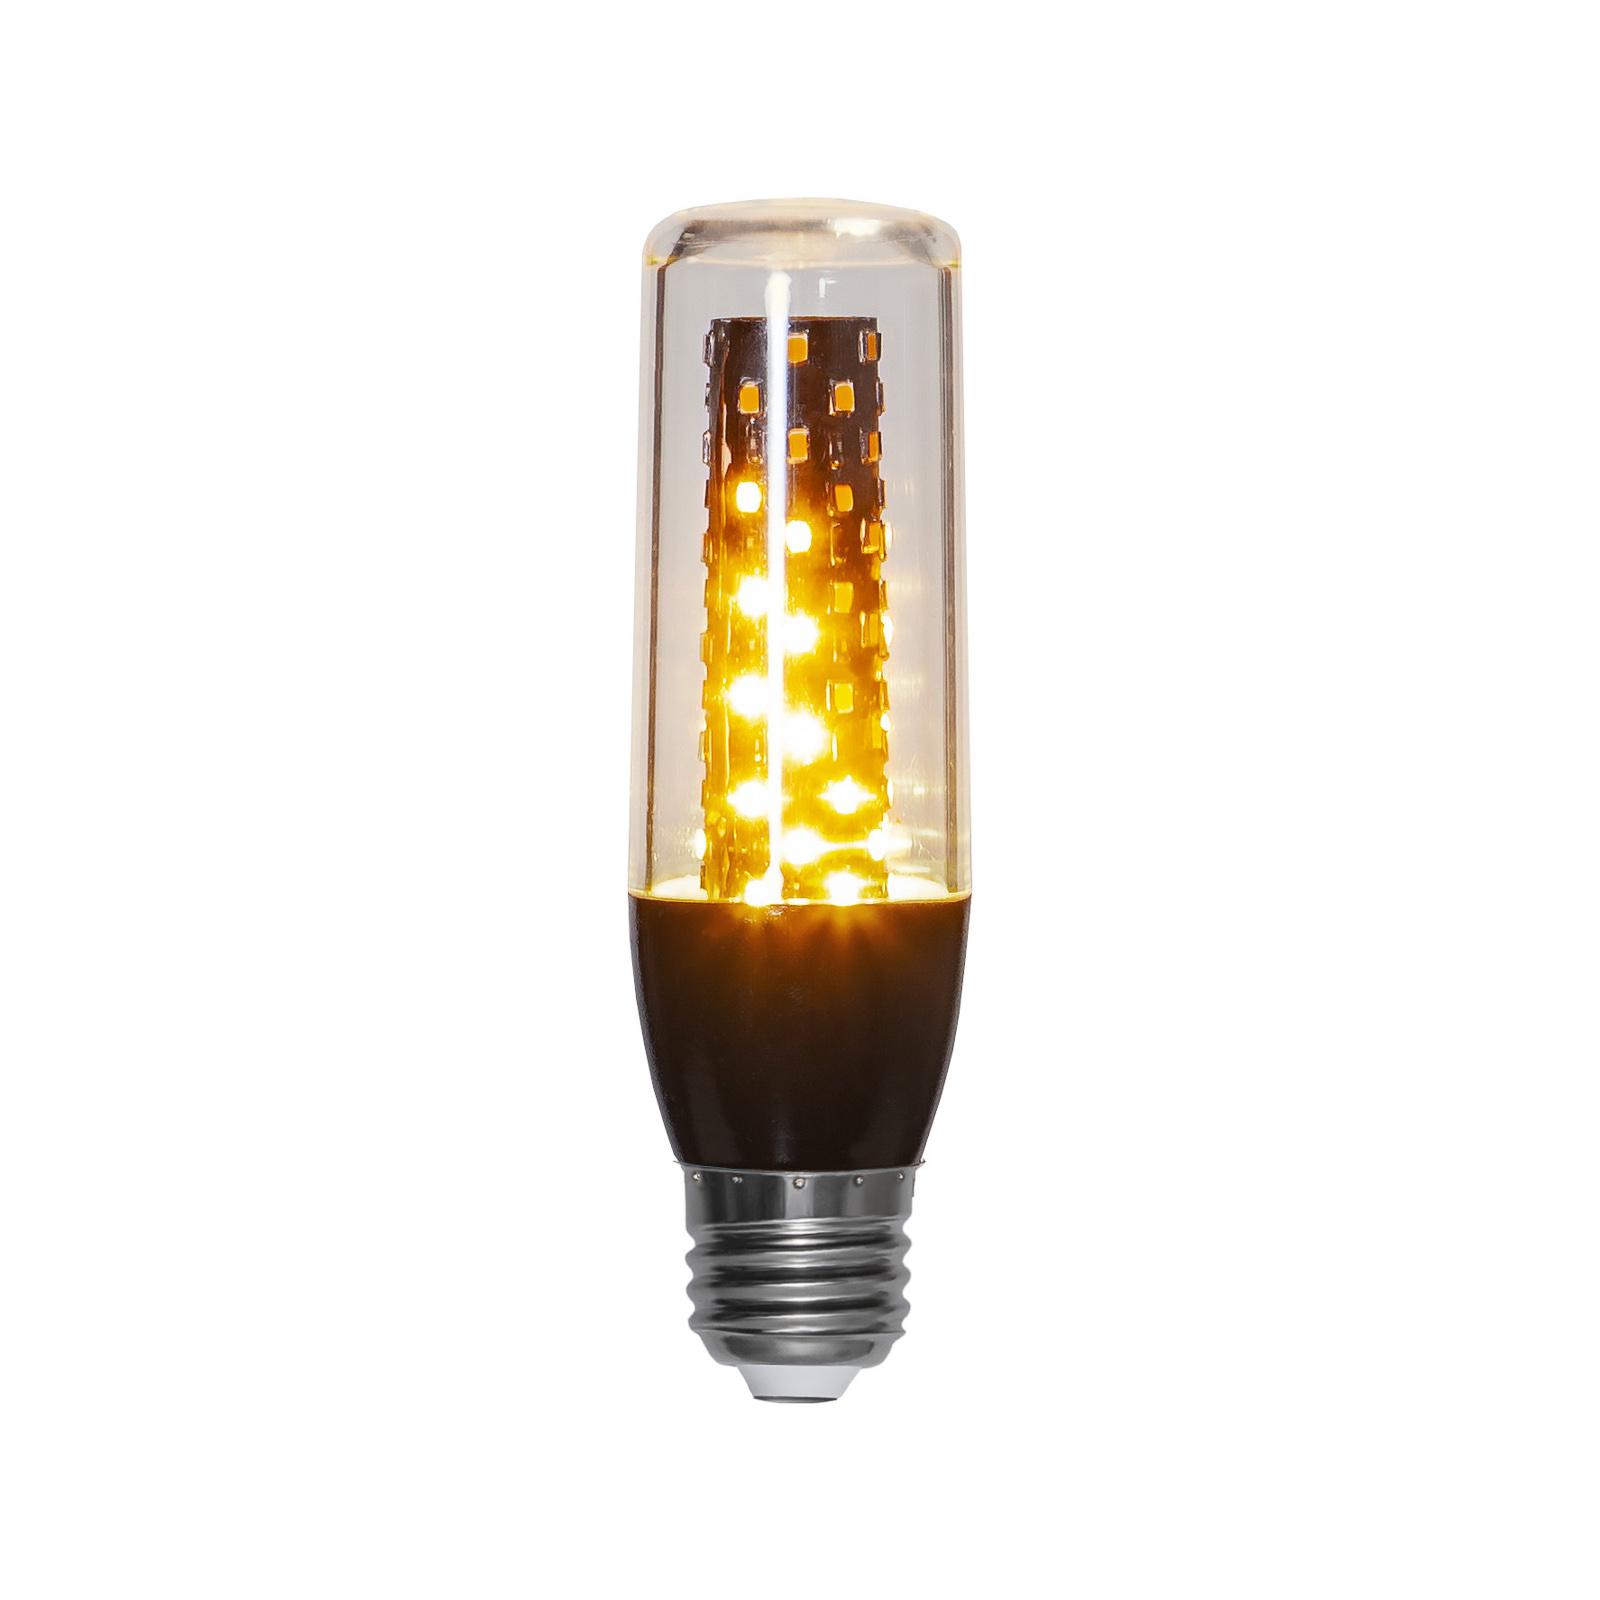 LED-Lampe Flame Lamp E27 3,3W m. Richtungssensor